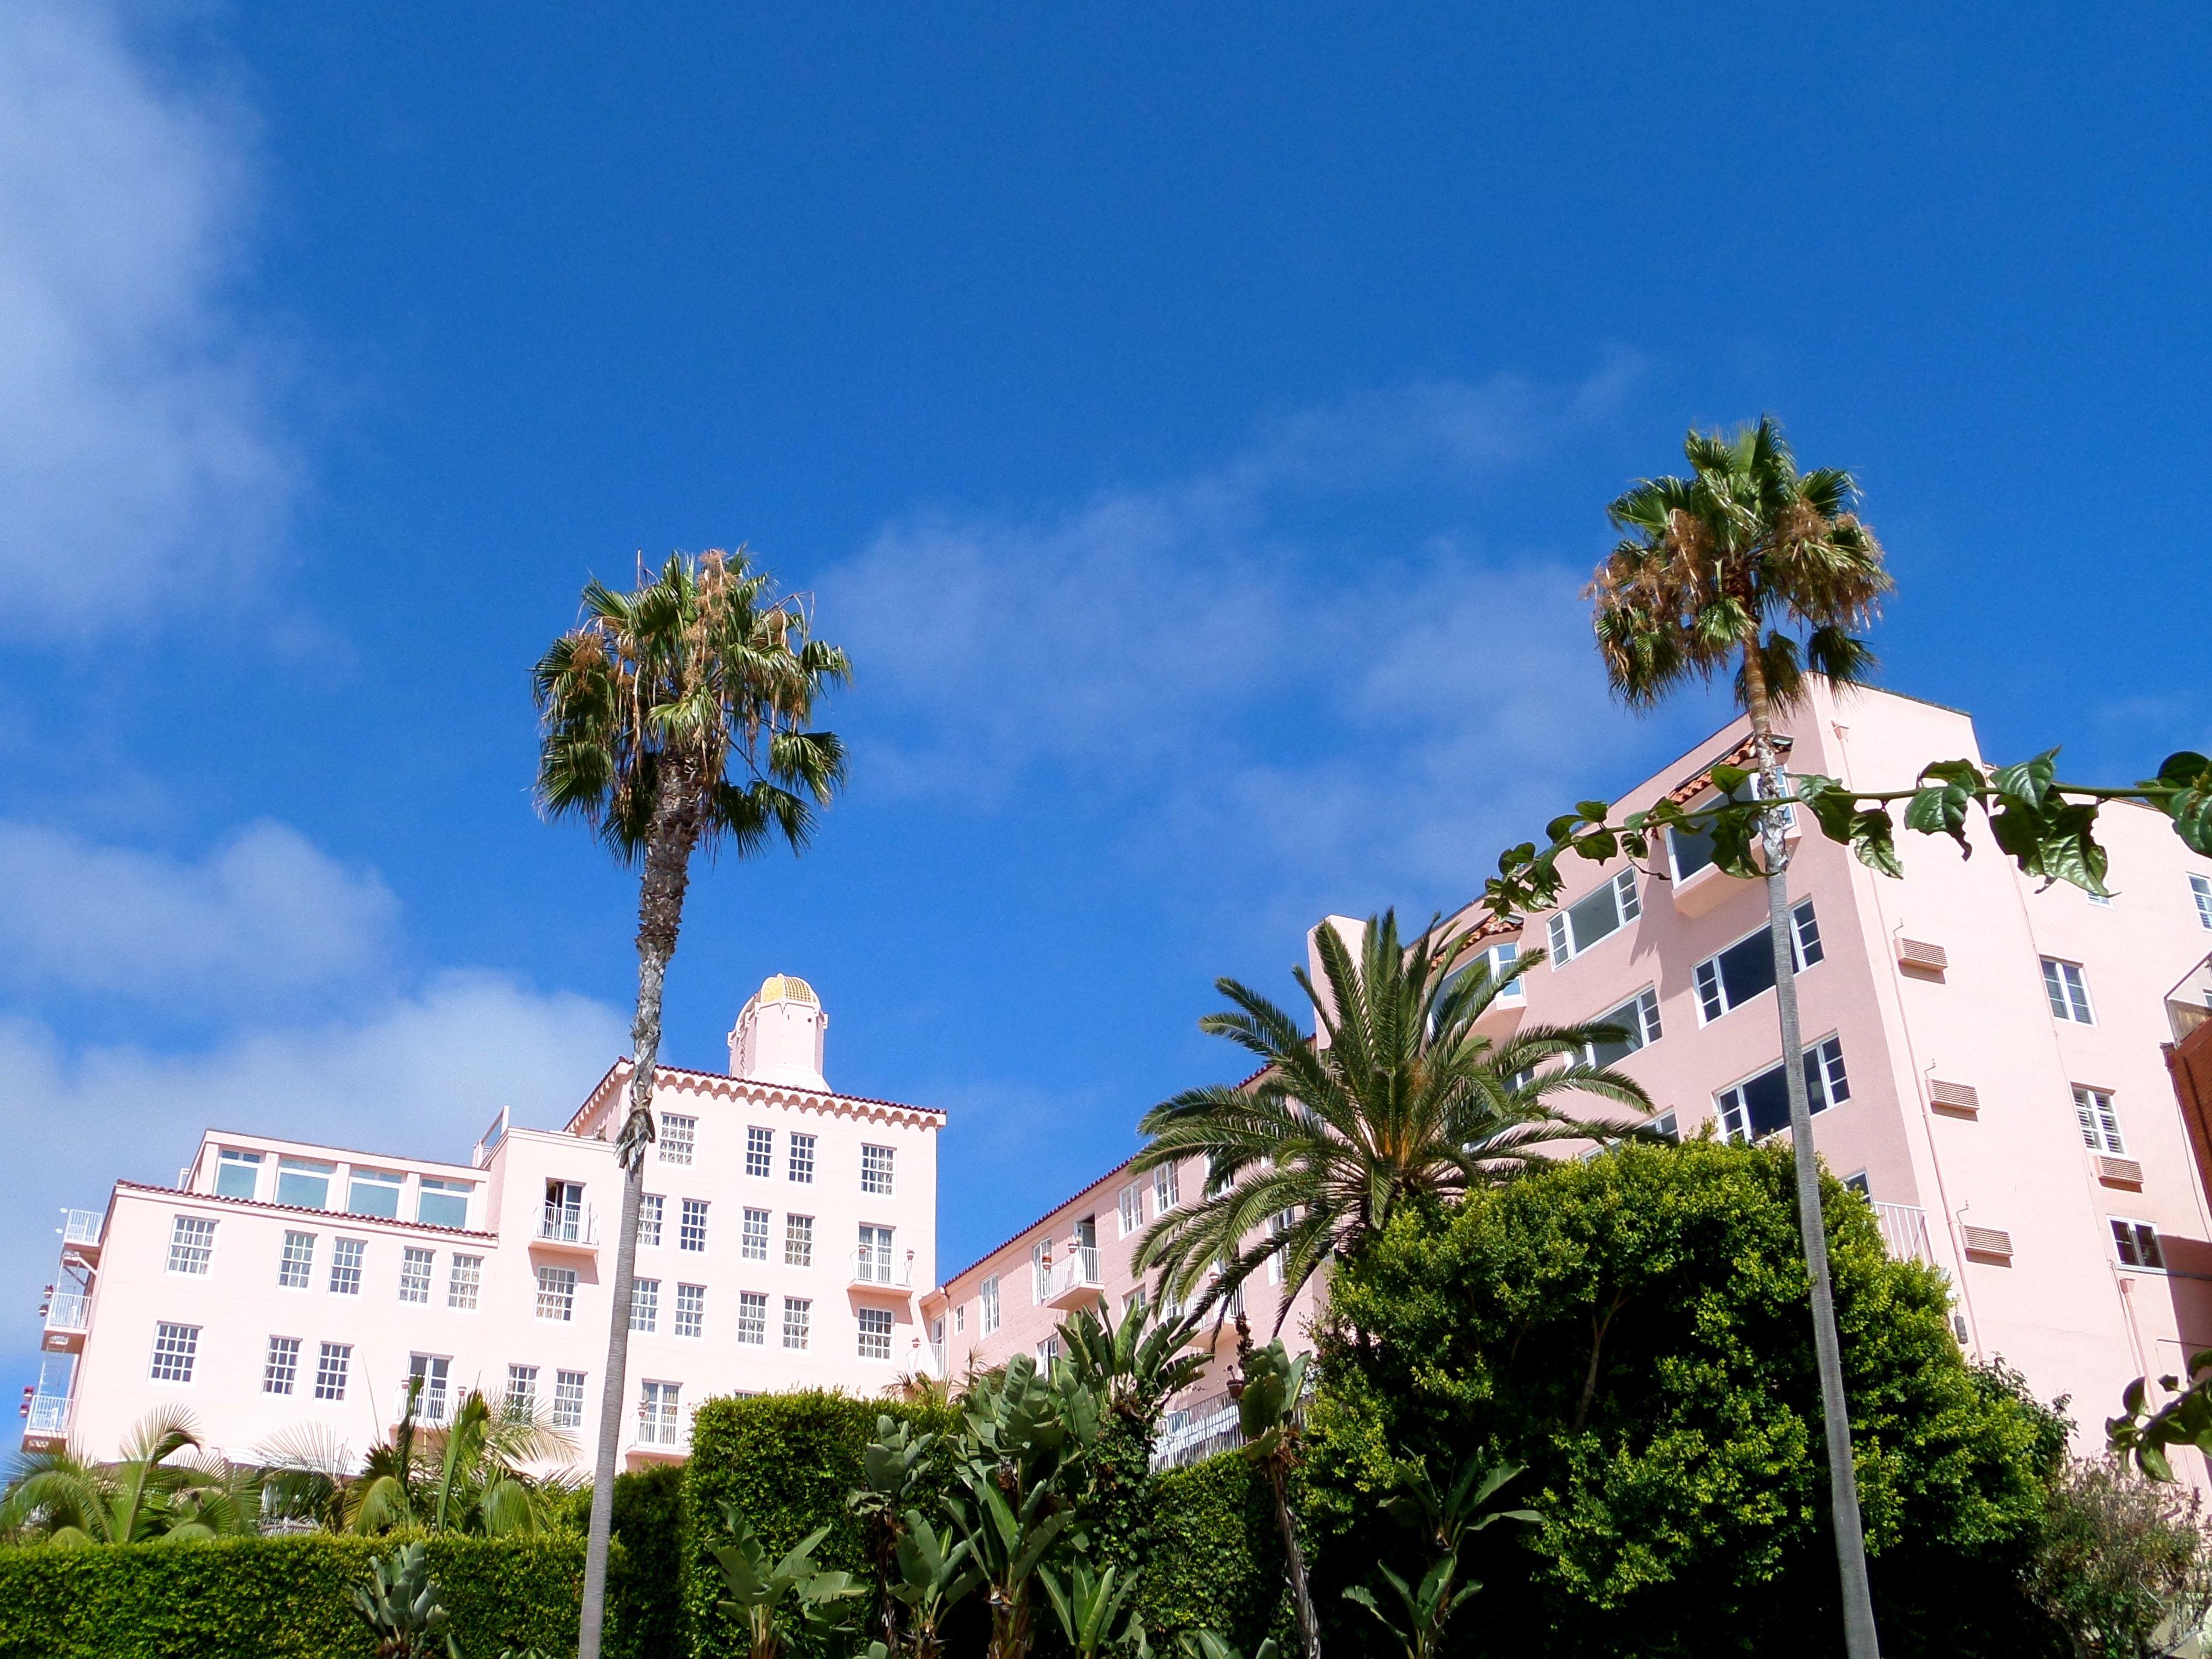 A Beautiful Southern California Day